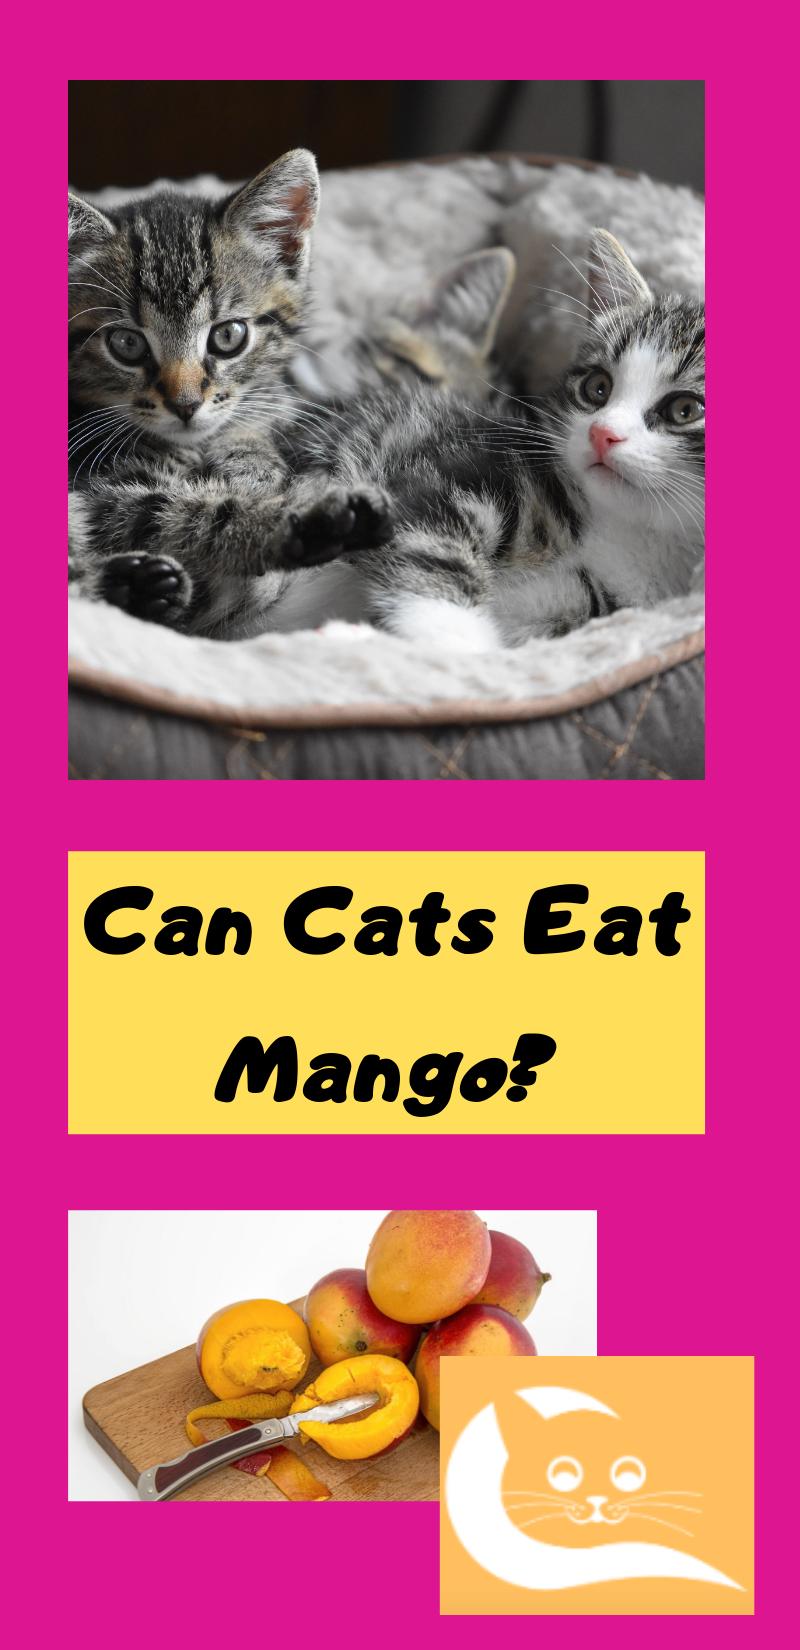 Can Cats Eat Mango Best cat food, Cats, Fancy salads